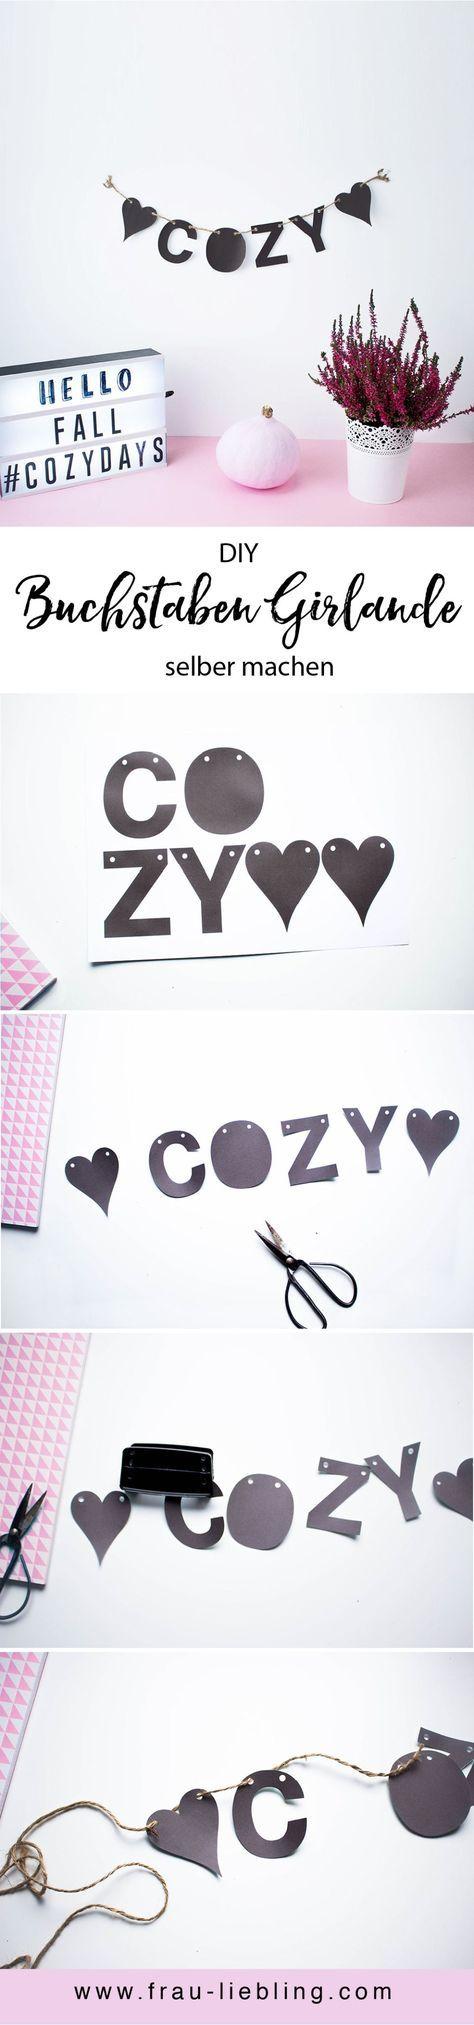 DIY Deko: Buchstaben Girlande selber machen